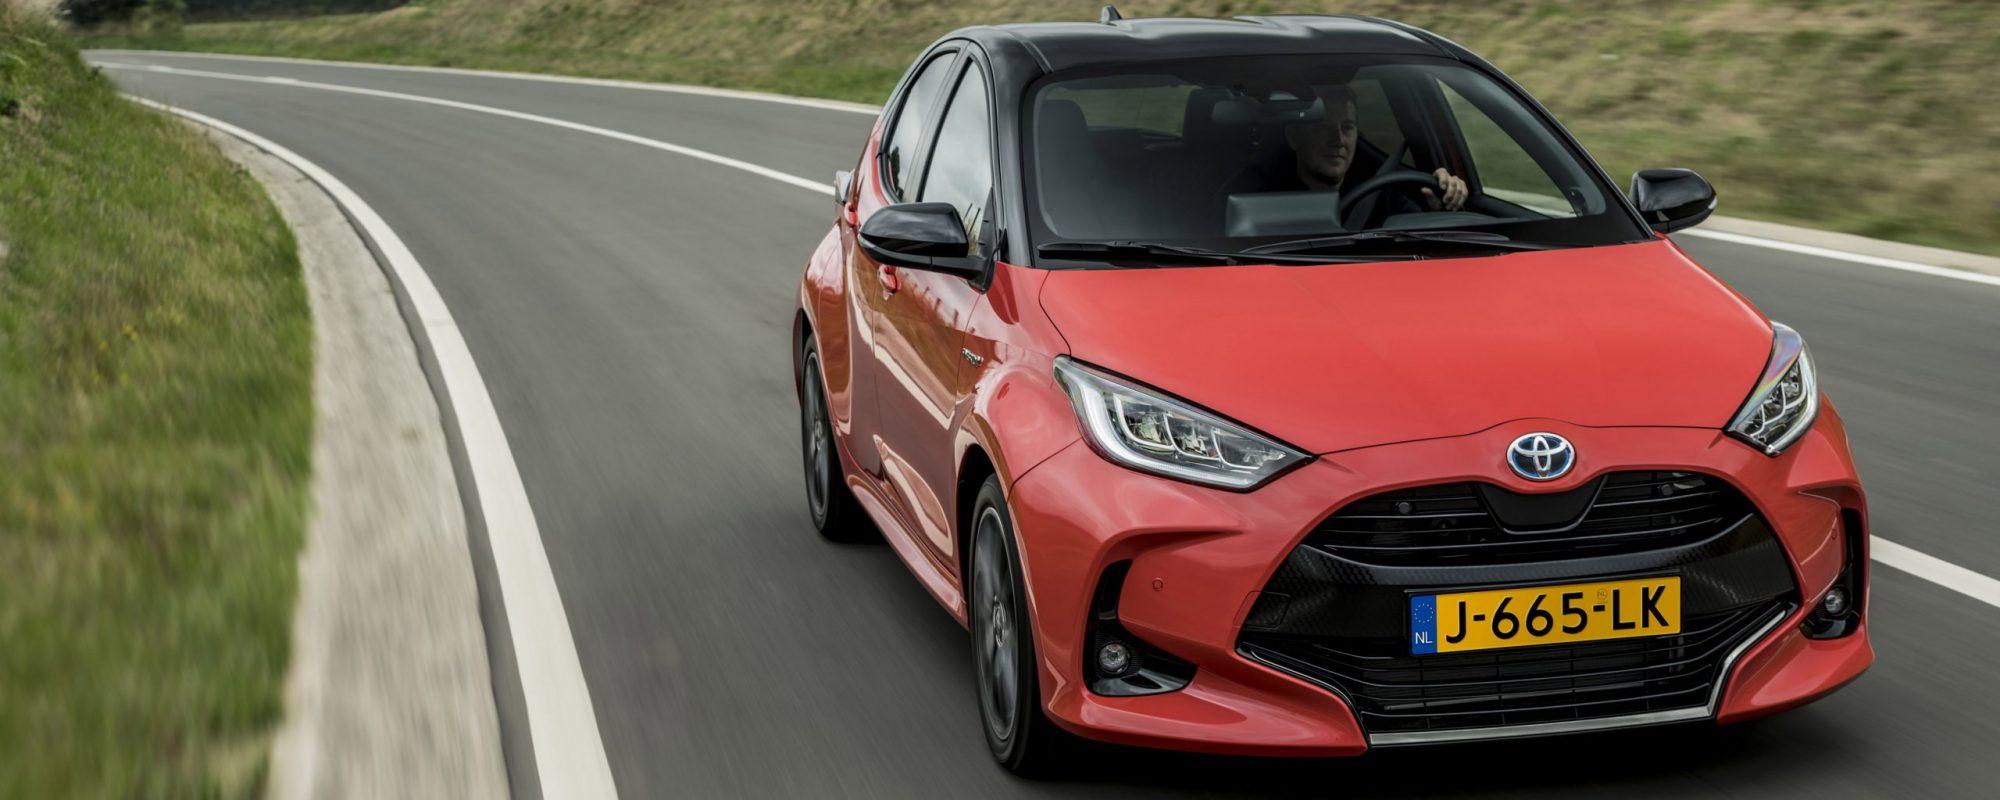 In 2020 Toyota populairste automerk onder particuliere kopers